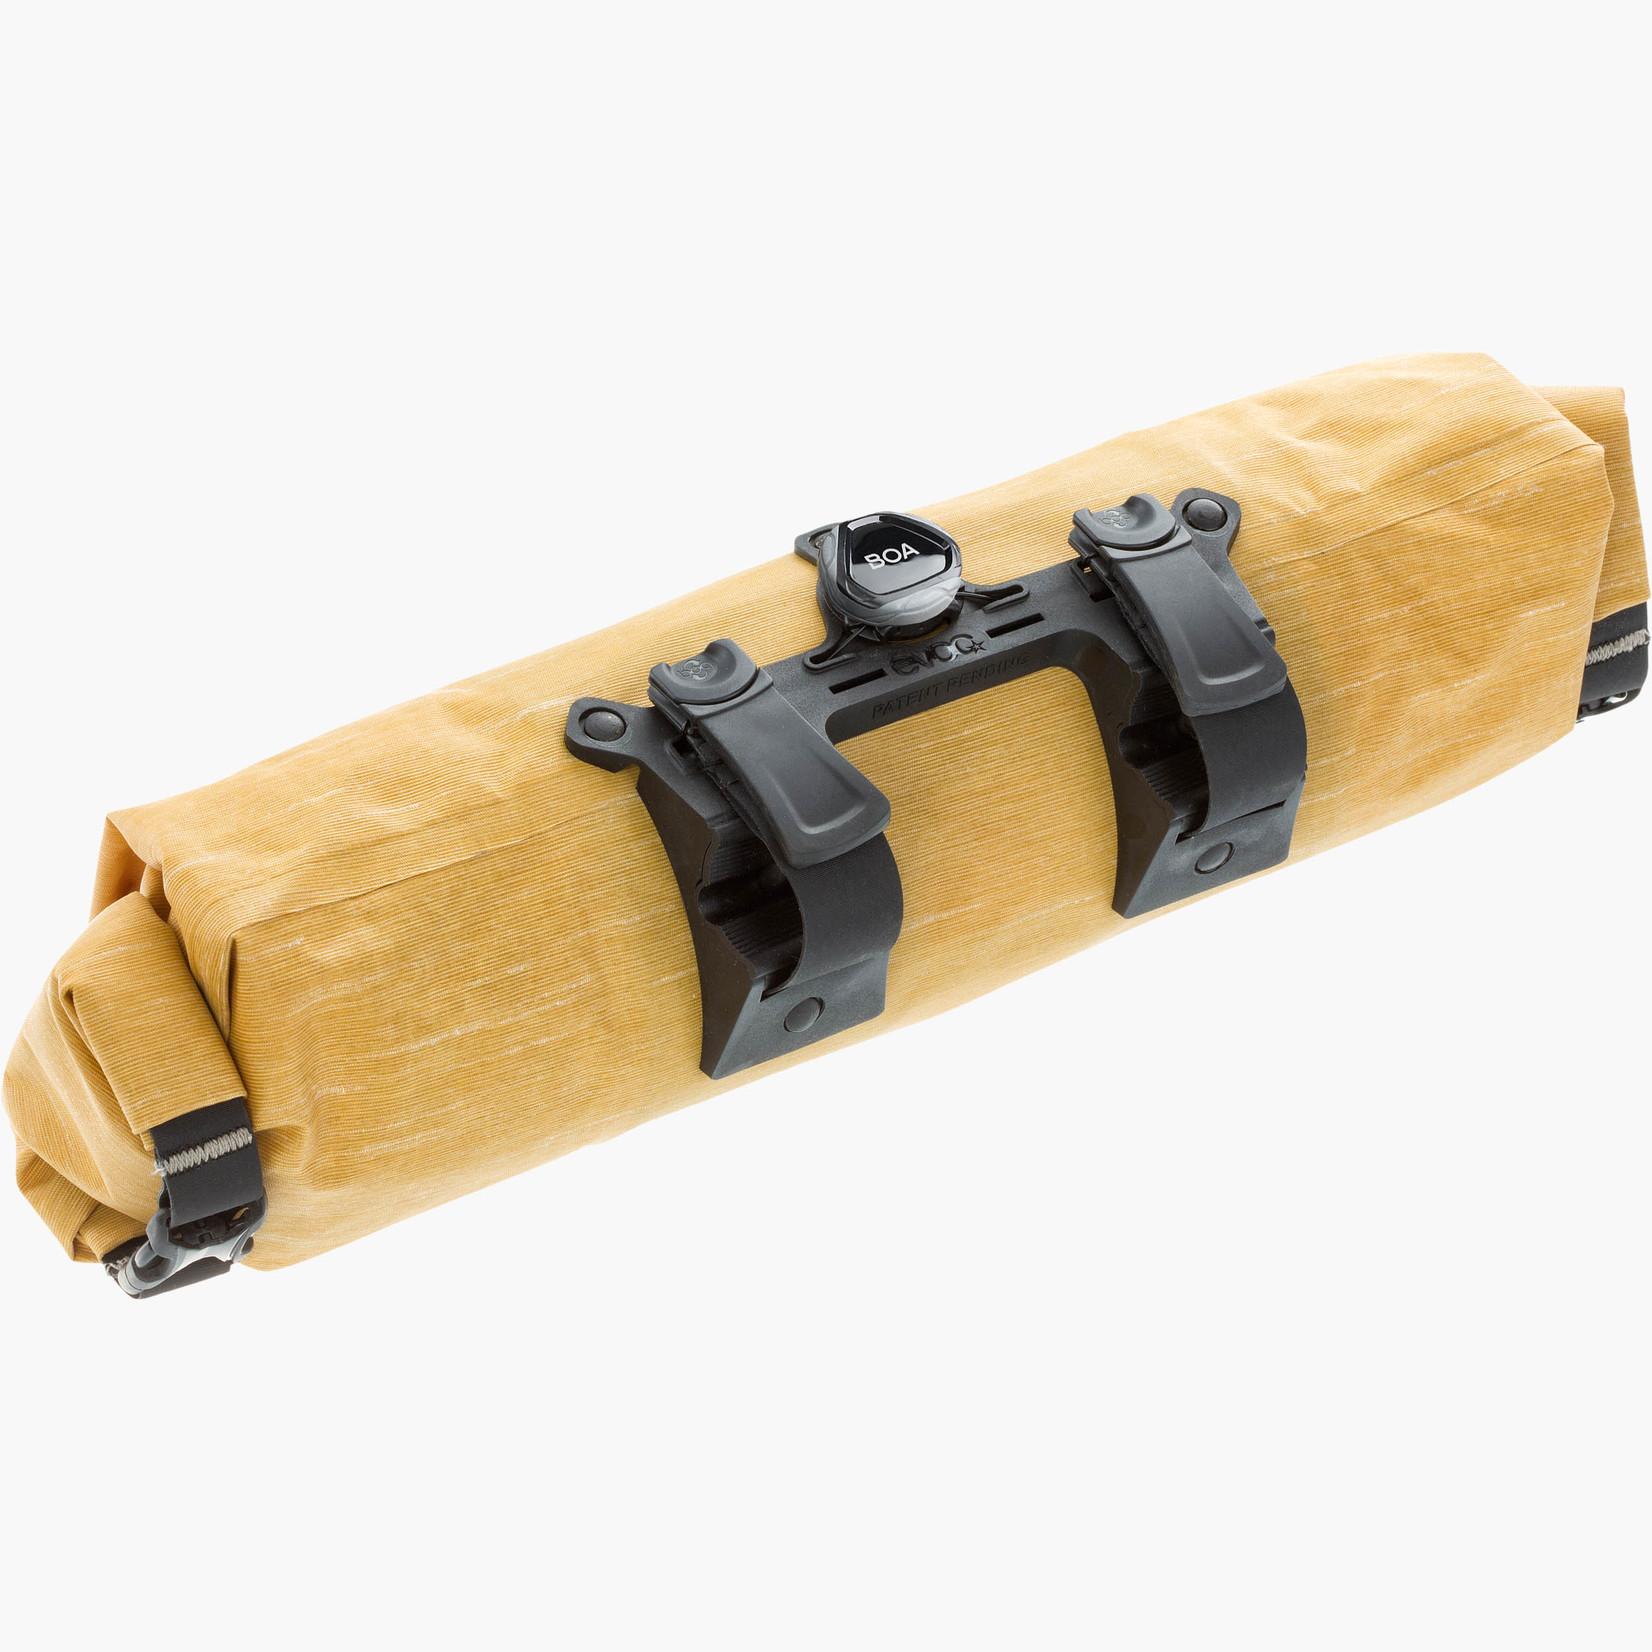 EVOC EVOC Handlebar Pack Boa M (2.5L)